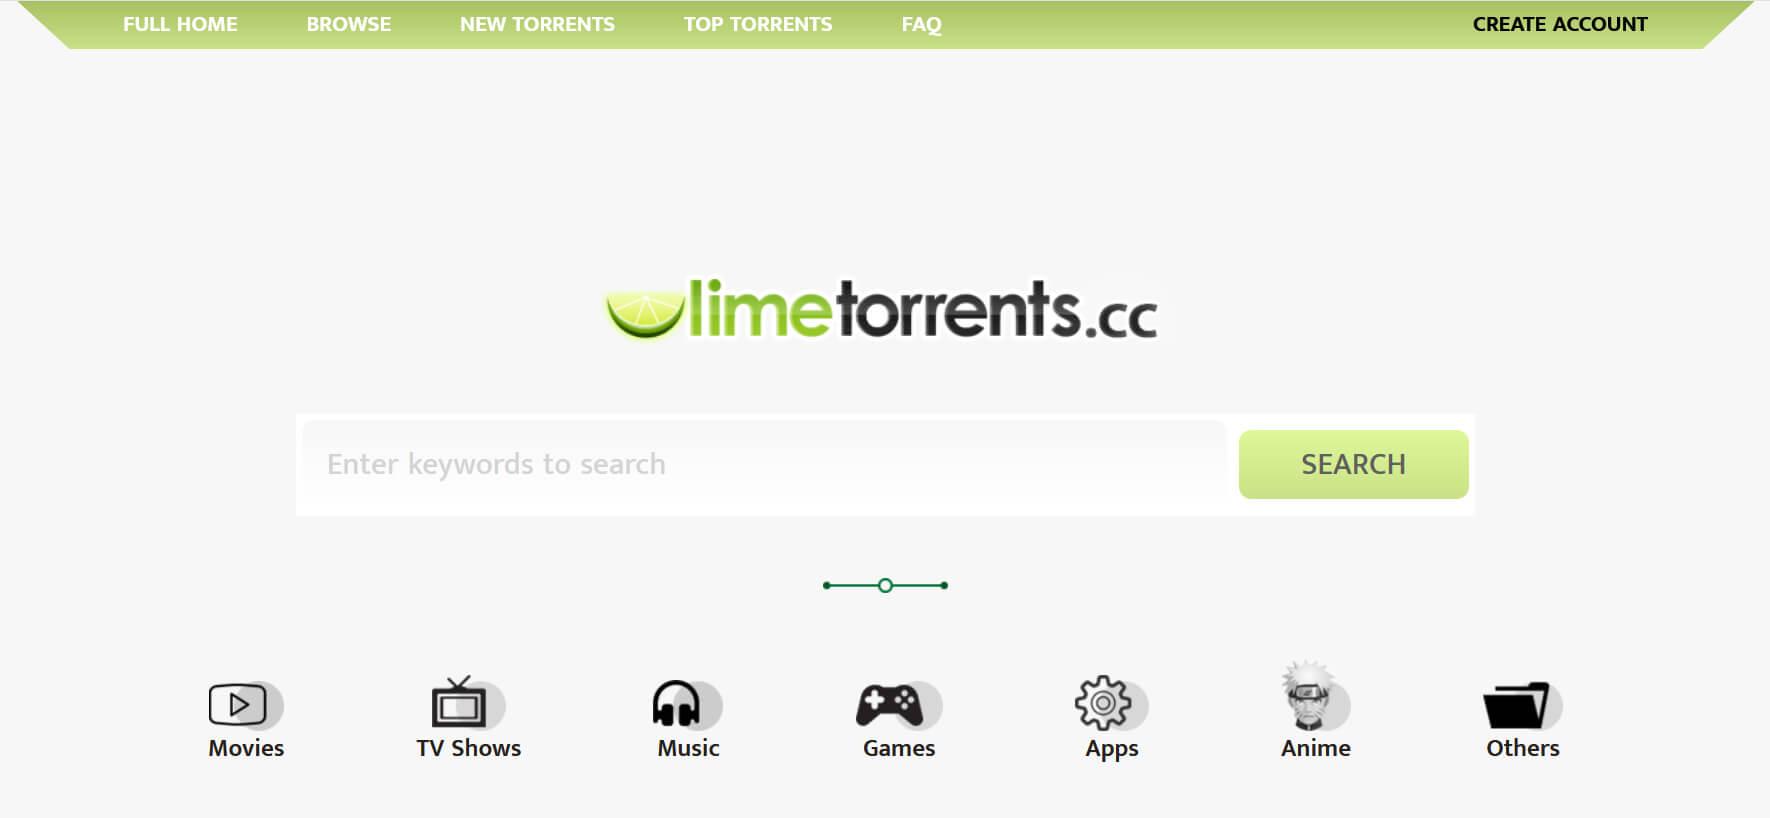 descargase en LimeTorrents